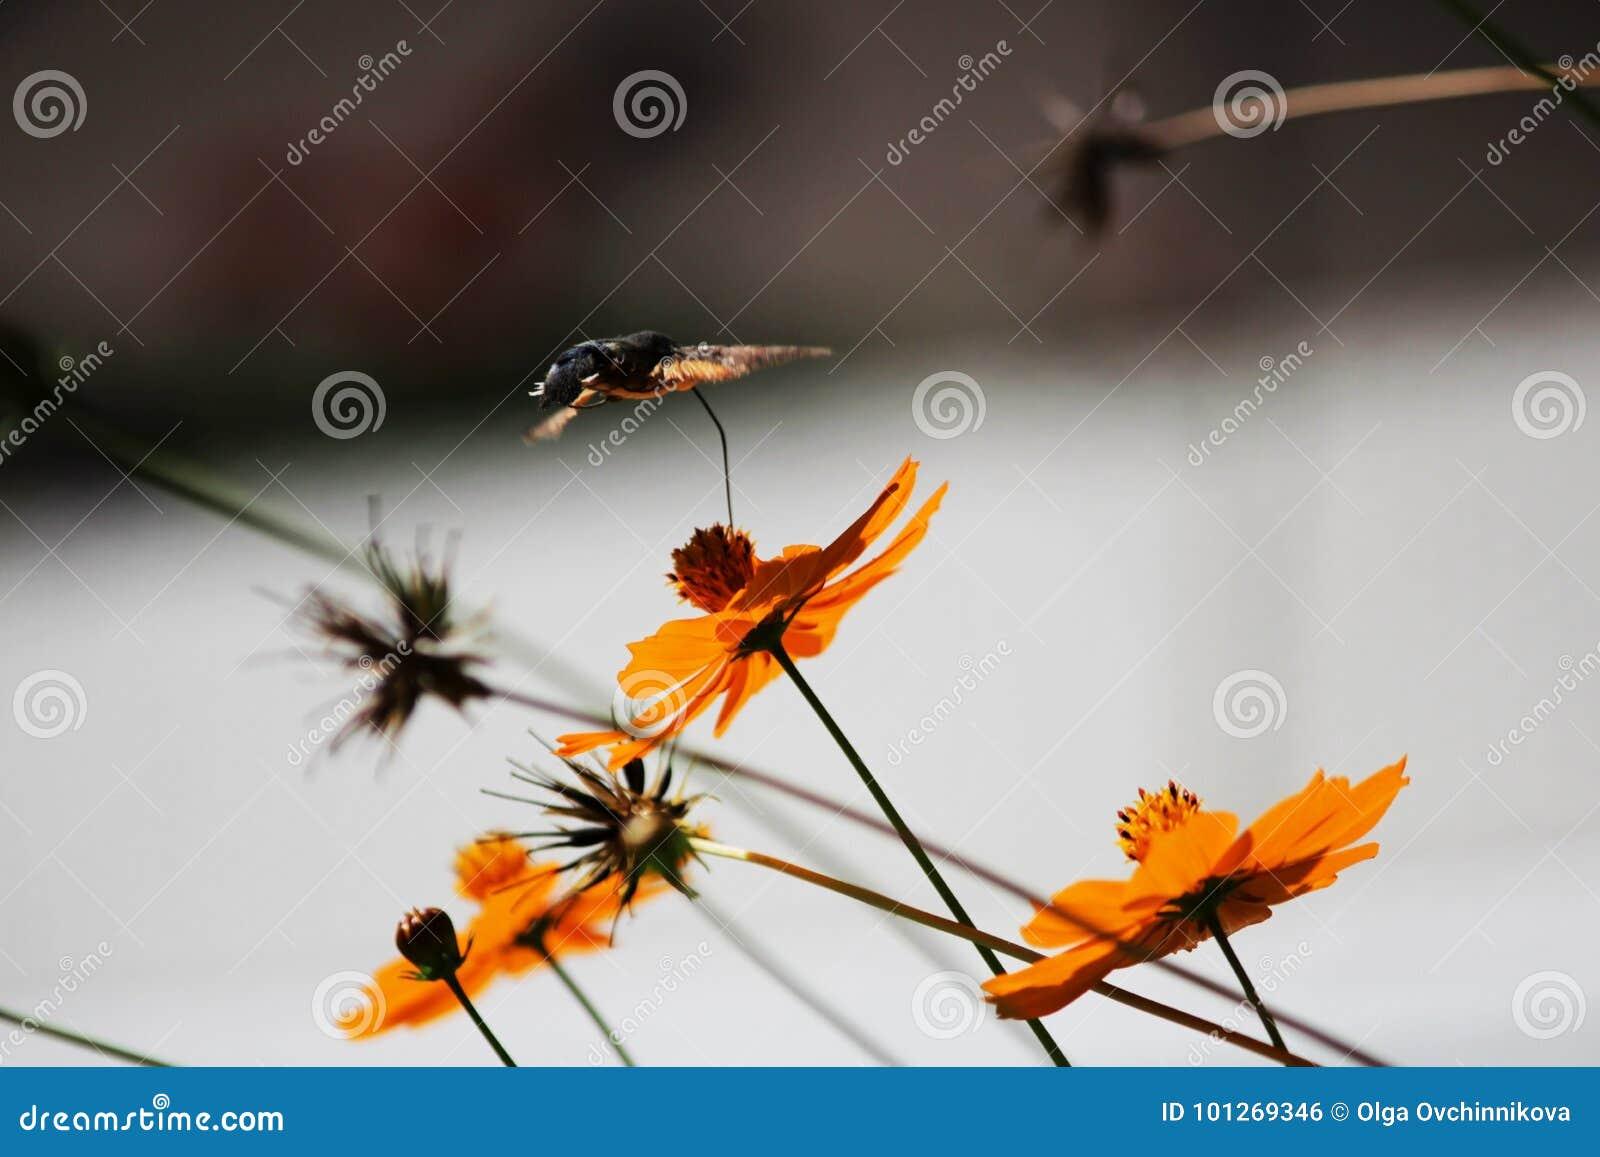 Sphingidae, Known As Bee Hawk-moth, Enjoying The Nectar Of A